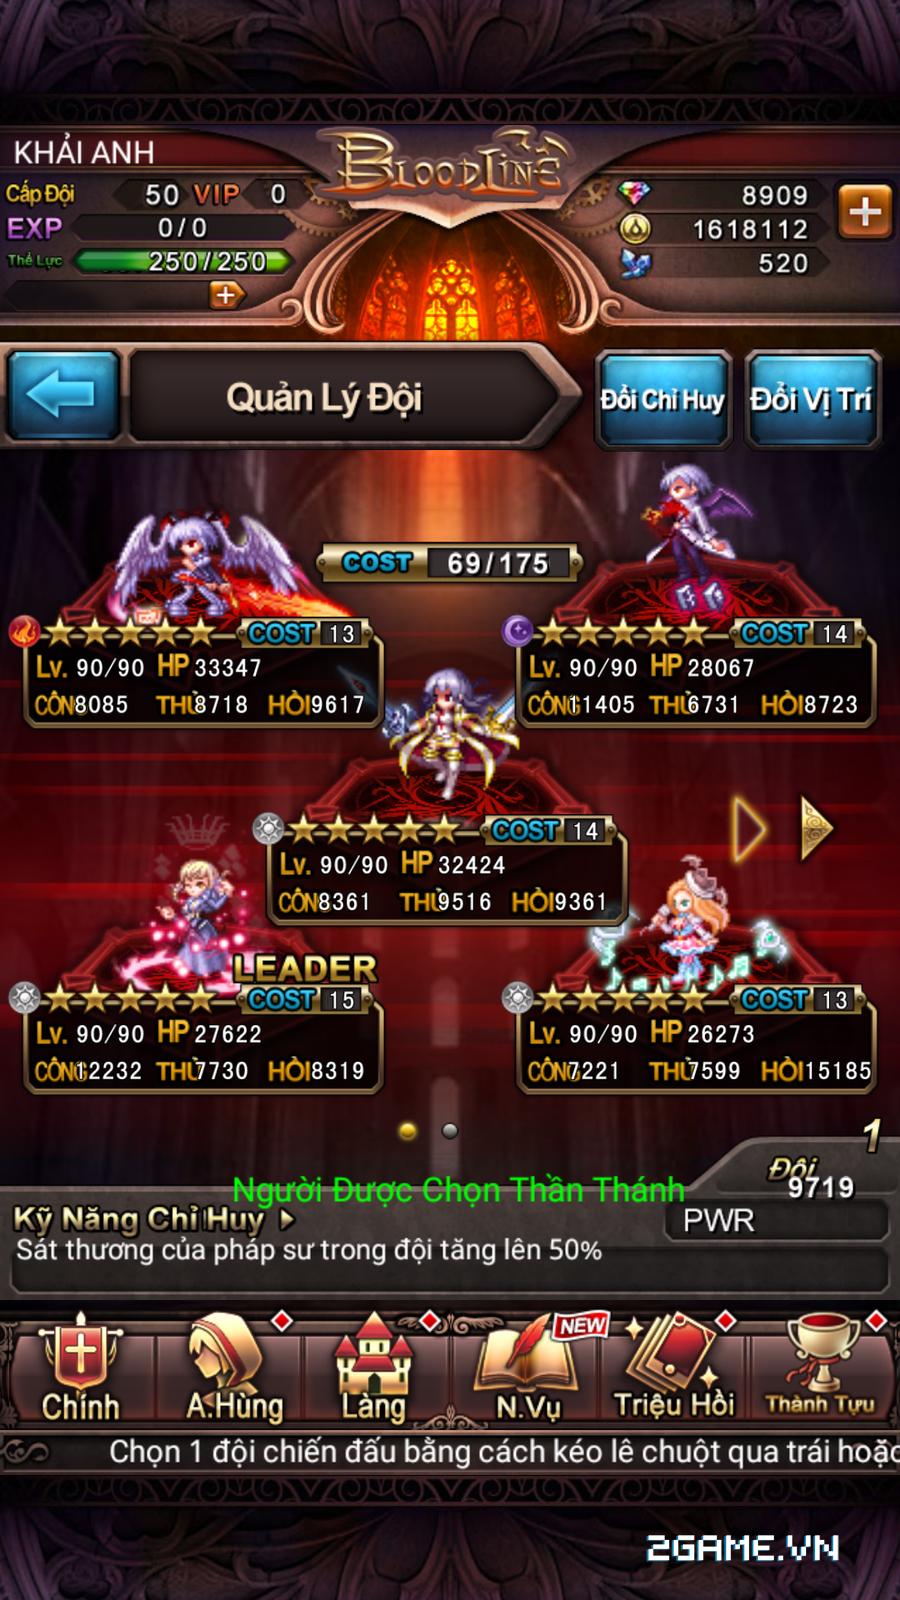 2game-Bloodline-viet-nam-mobile-7.jpg (900×1600)